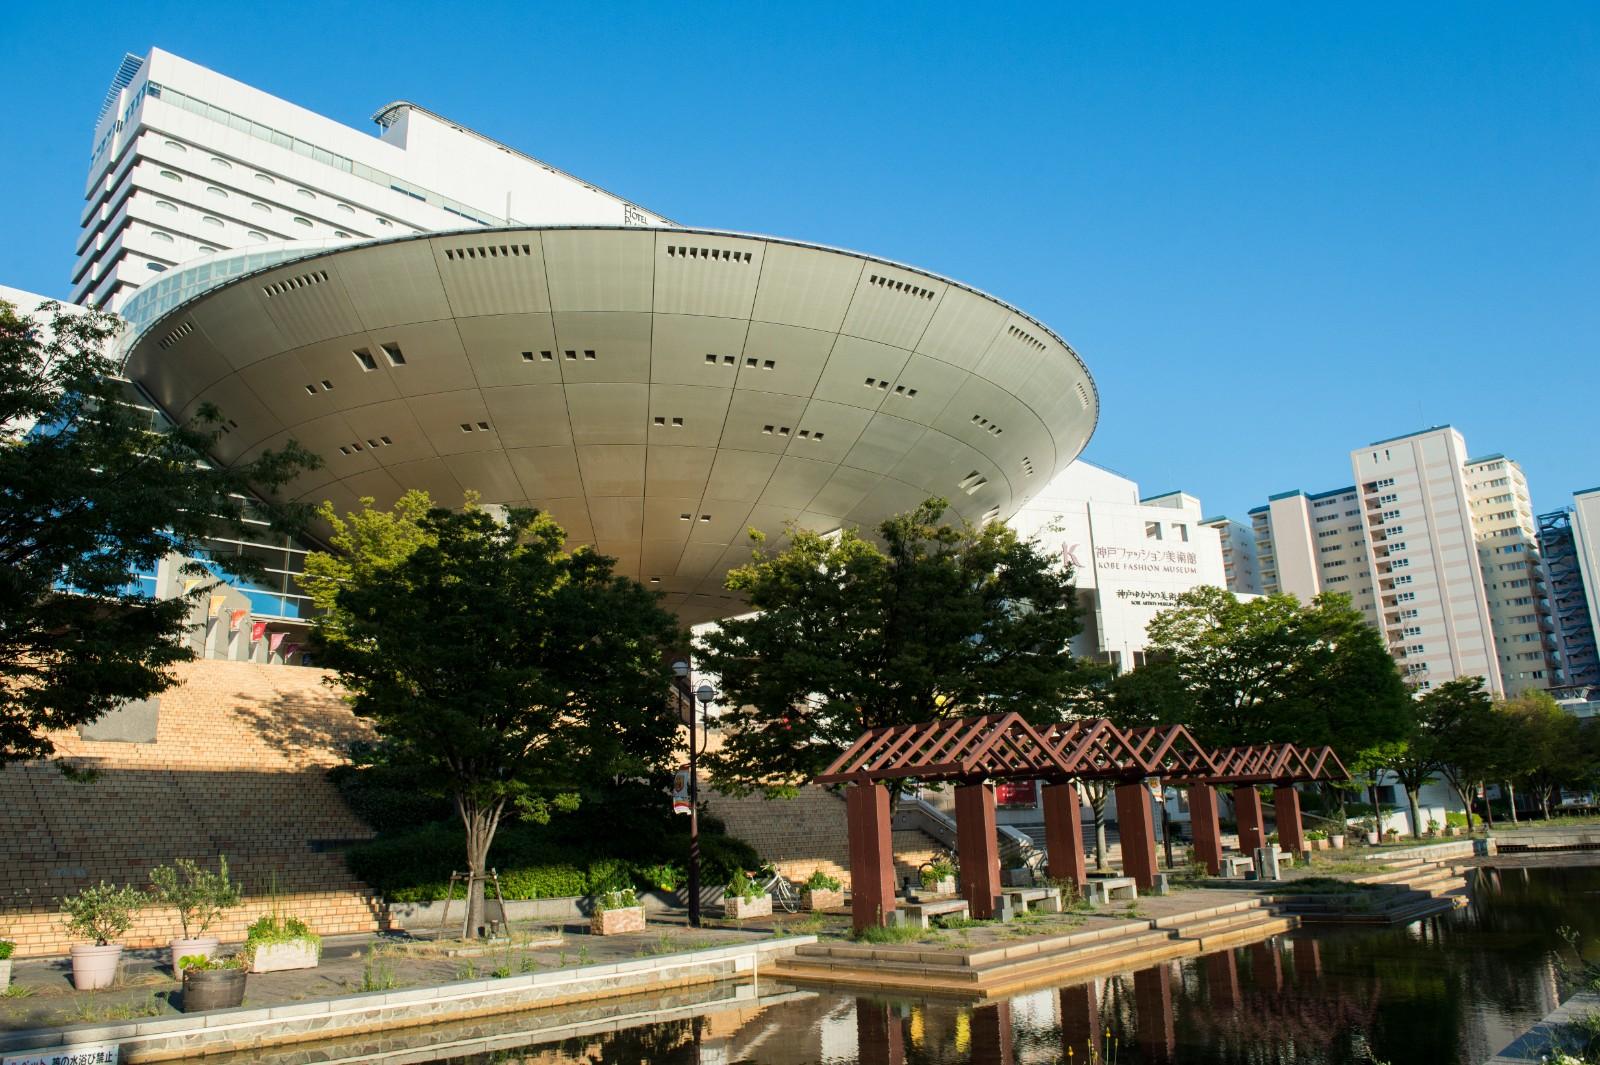 8D7N.Kobe City.Budget.Free & Easy. (From Kobe (UKB) Airport)* Alpha Magic 20*